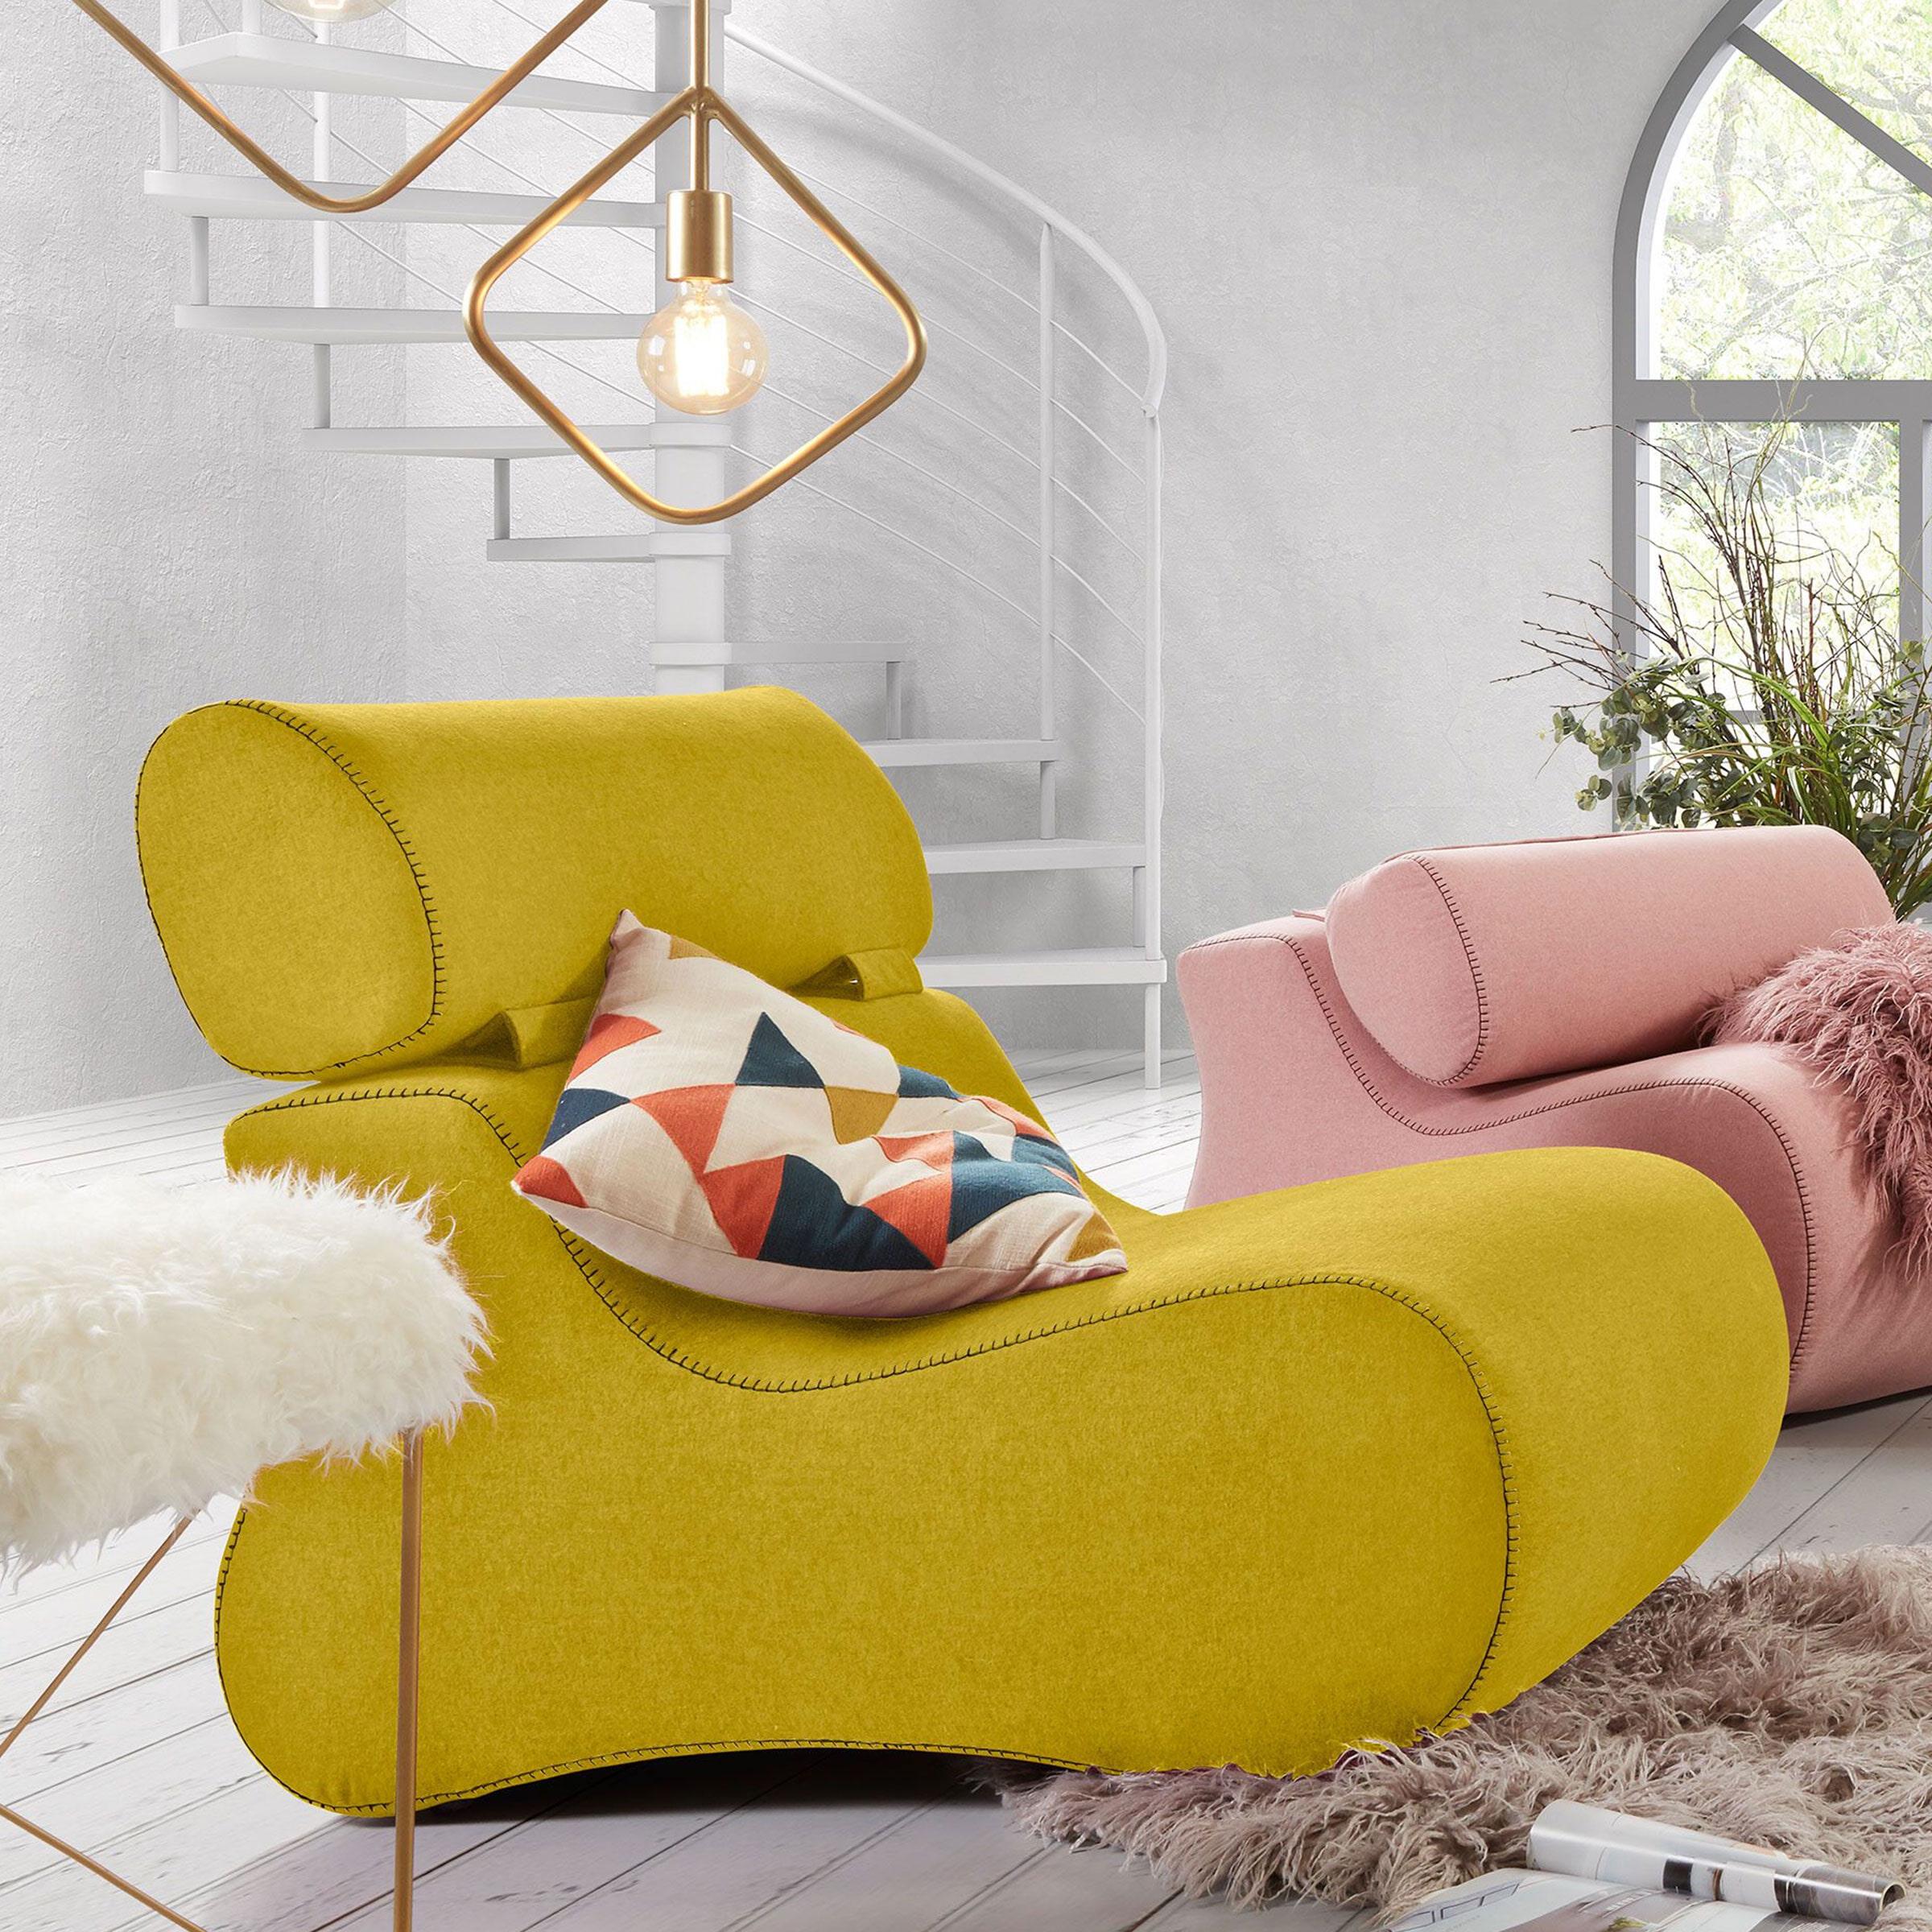 Kave Home Fauteuil 'Club' kleur geel